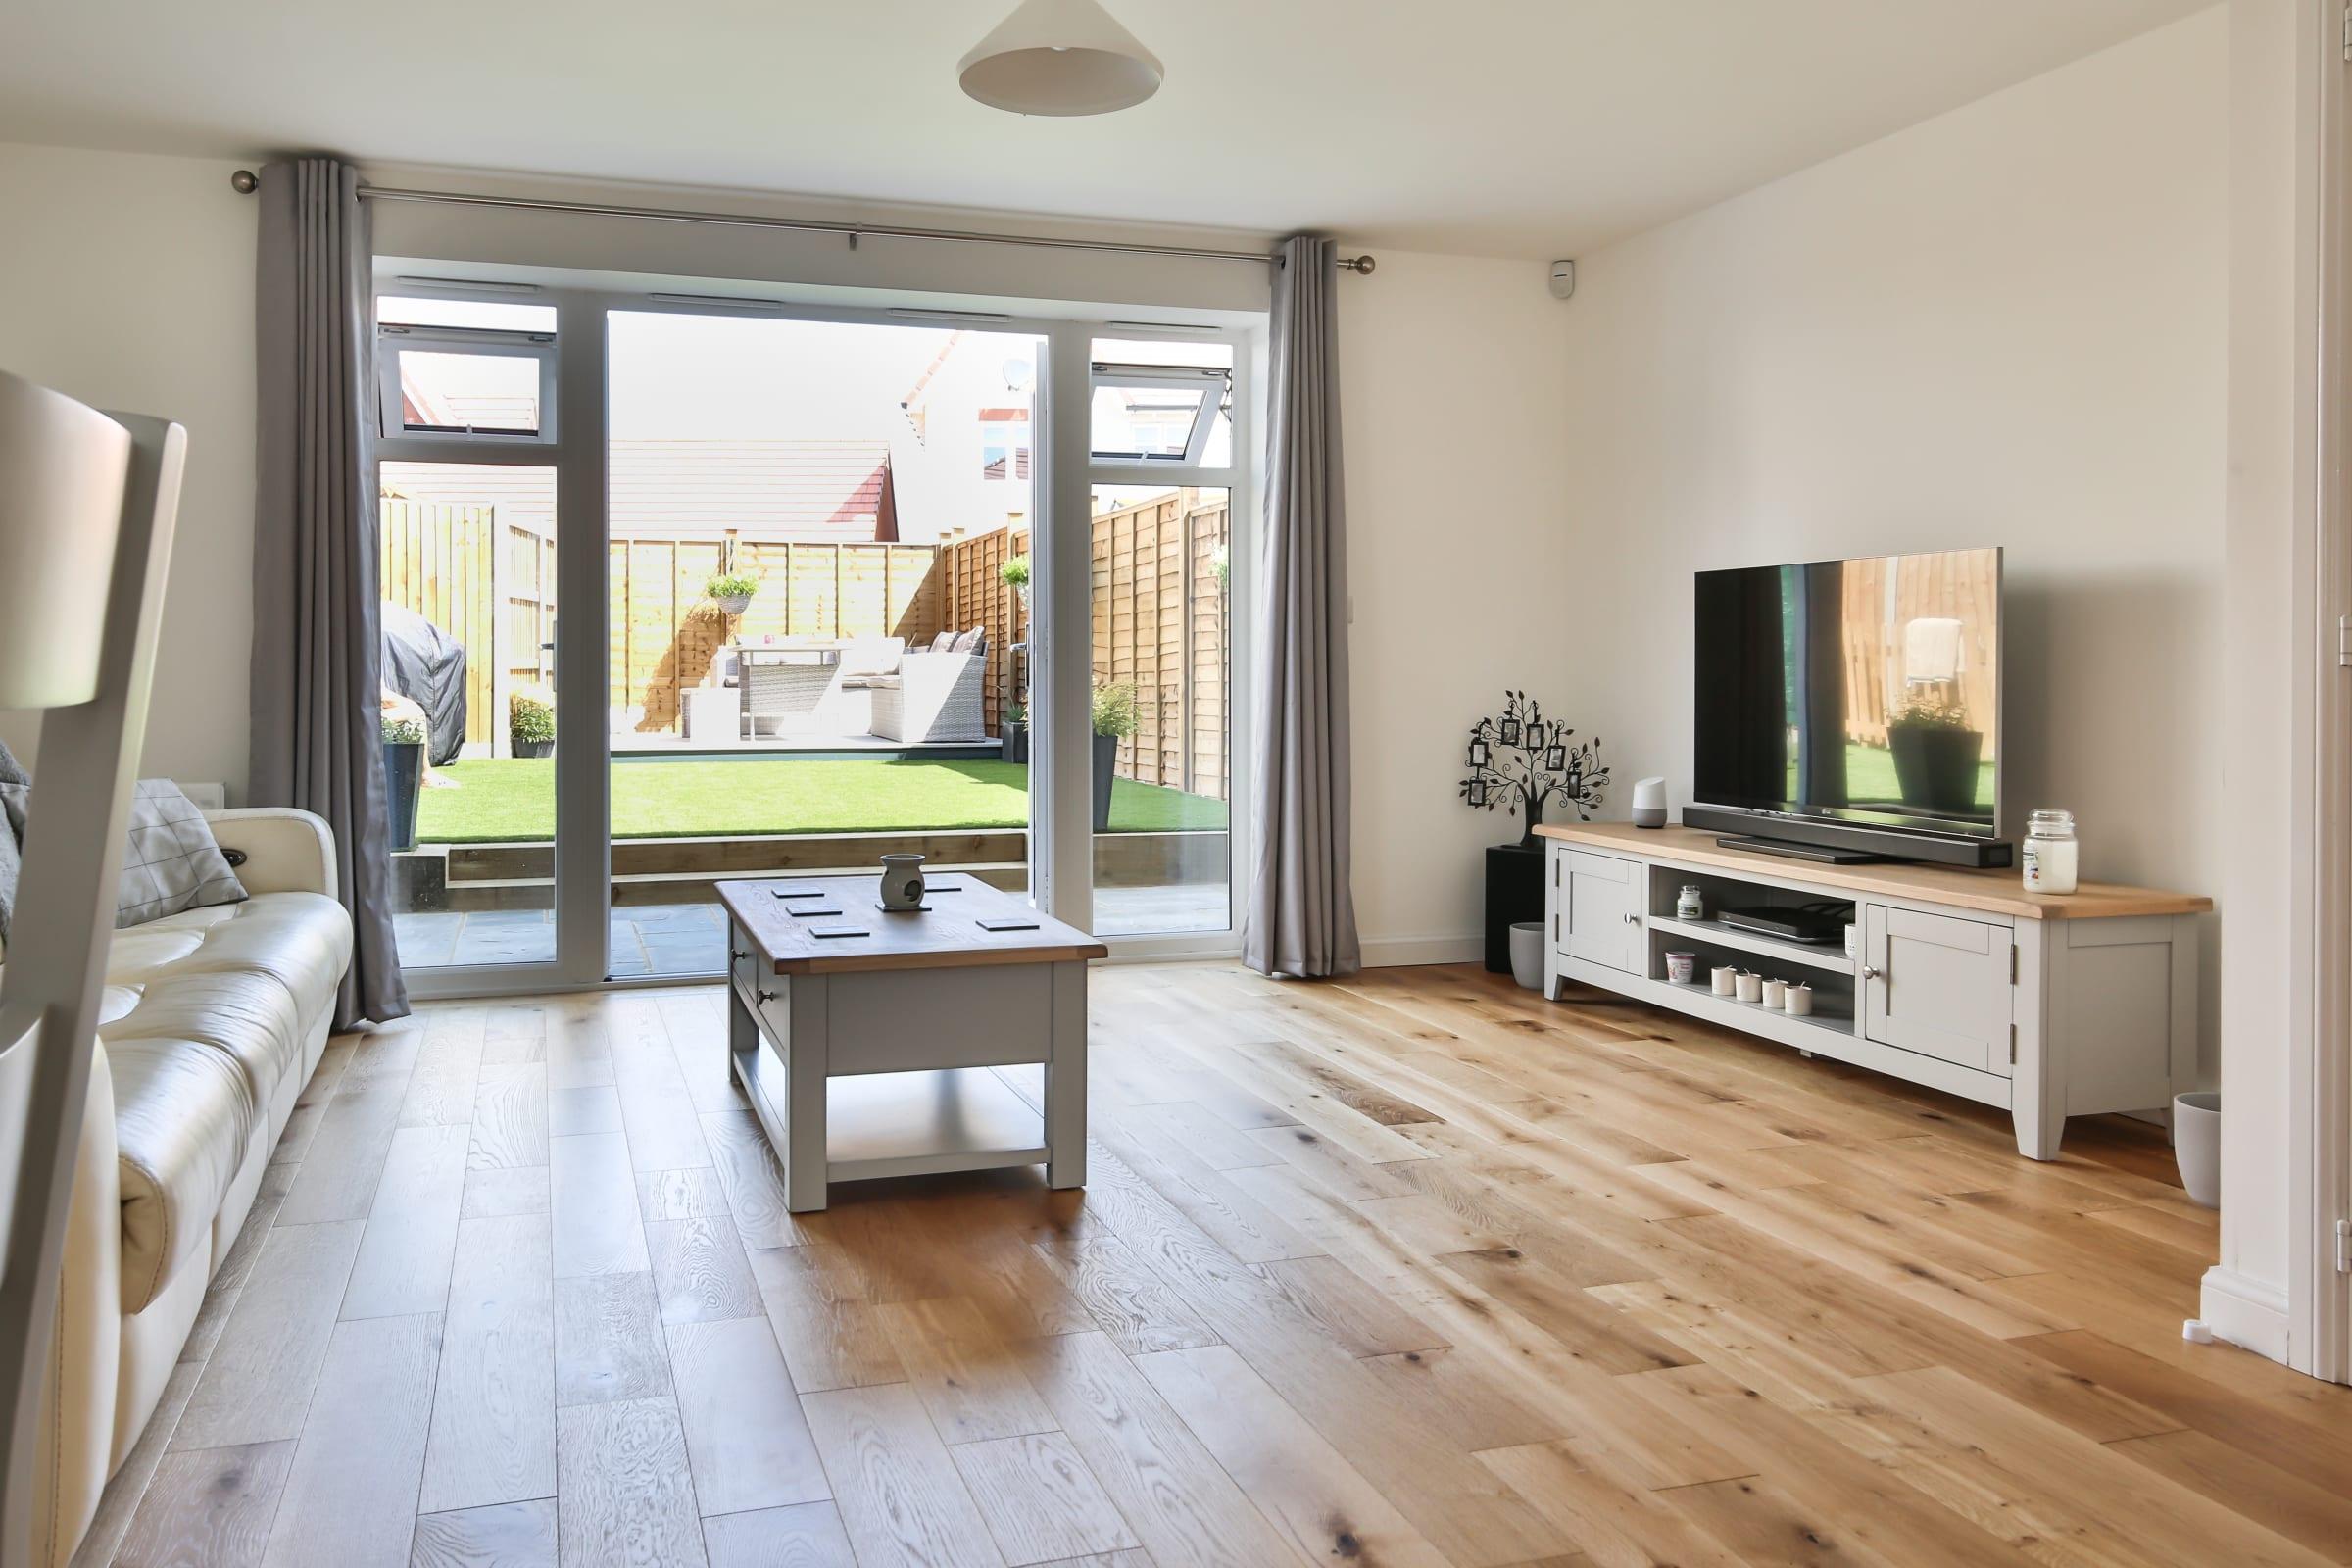 Swindon home with Eiger Petit wood floors 6